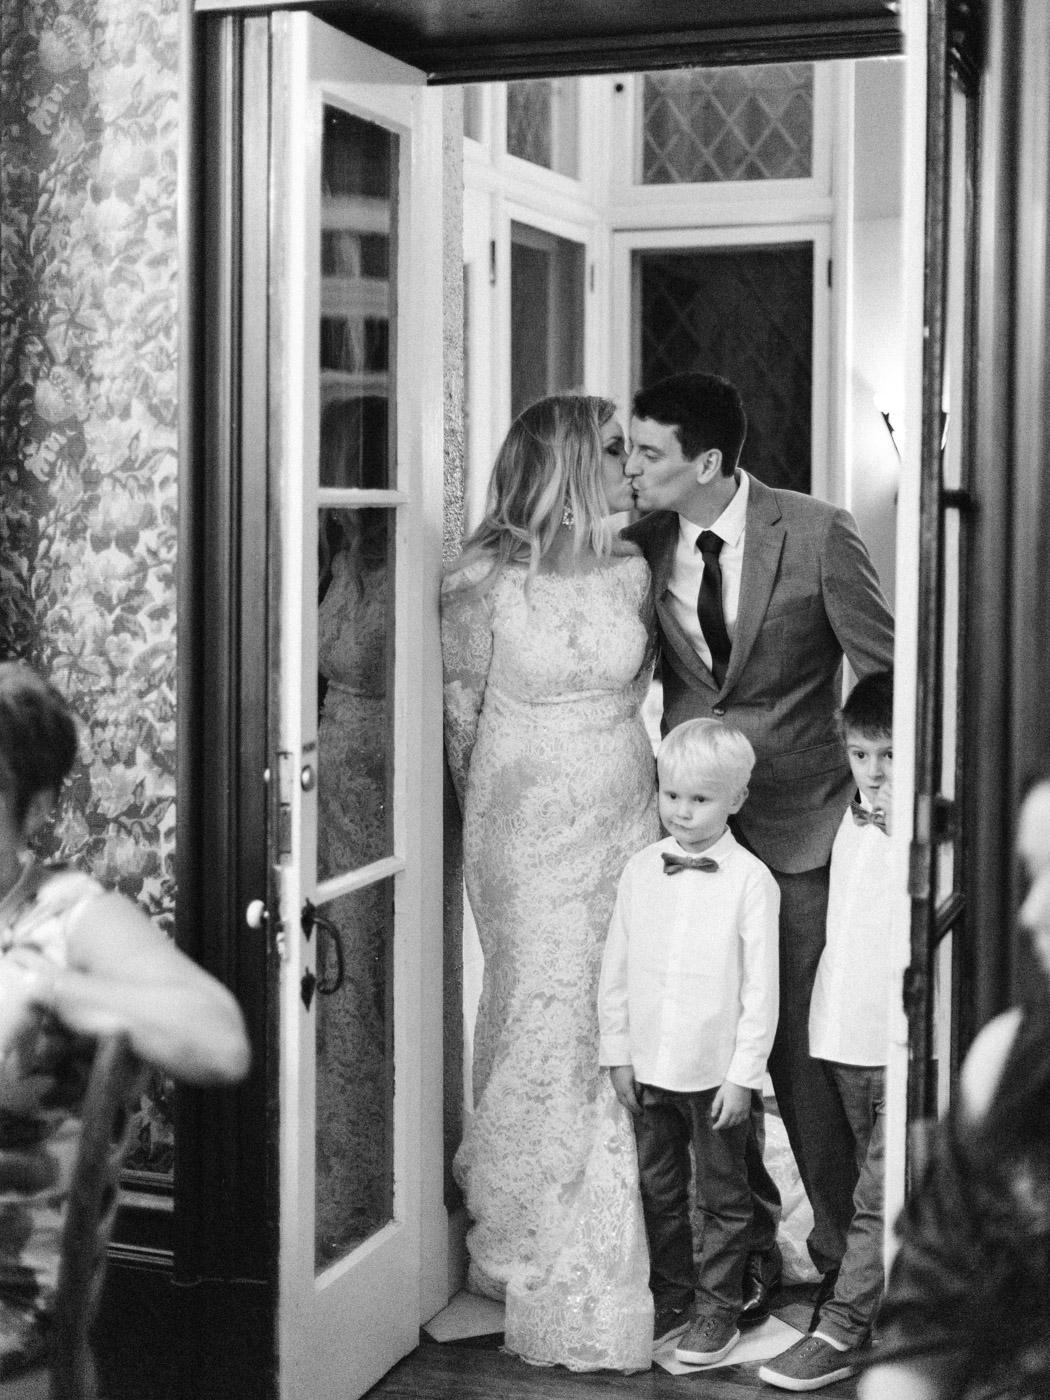 Toronto-wedding-photographer-intimate-classic-fine-art-elopement-ottawa98.jpg